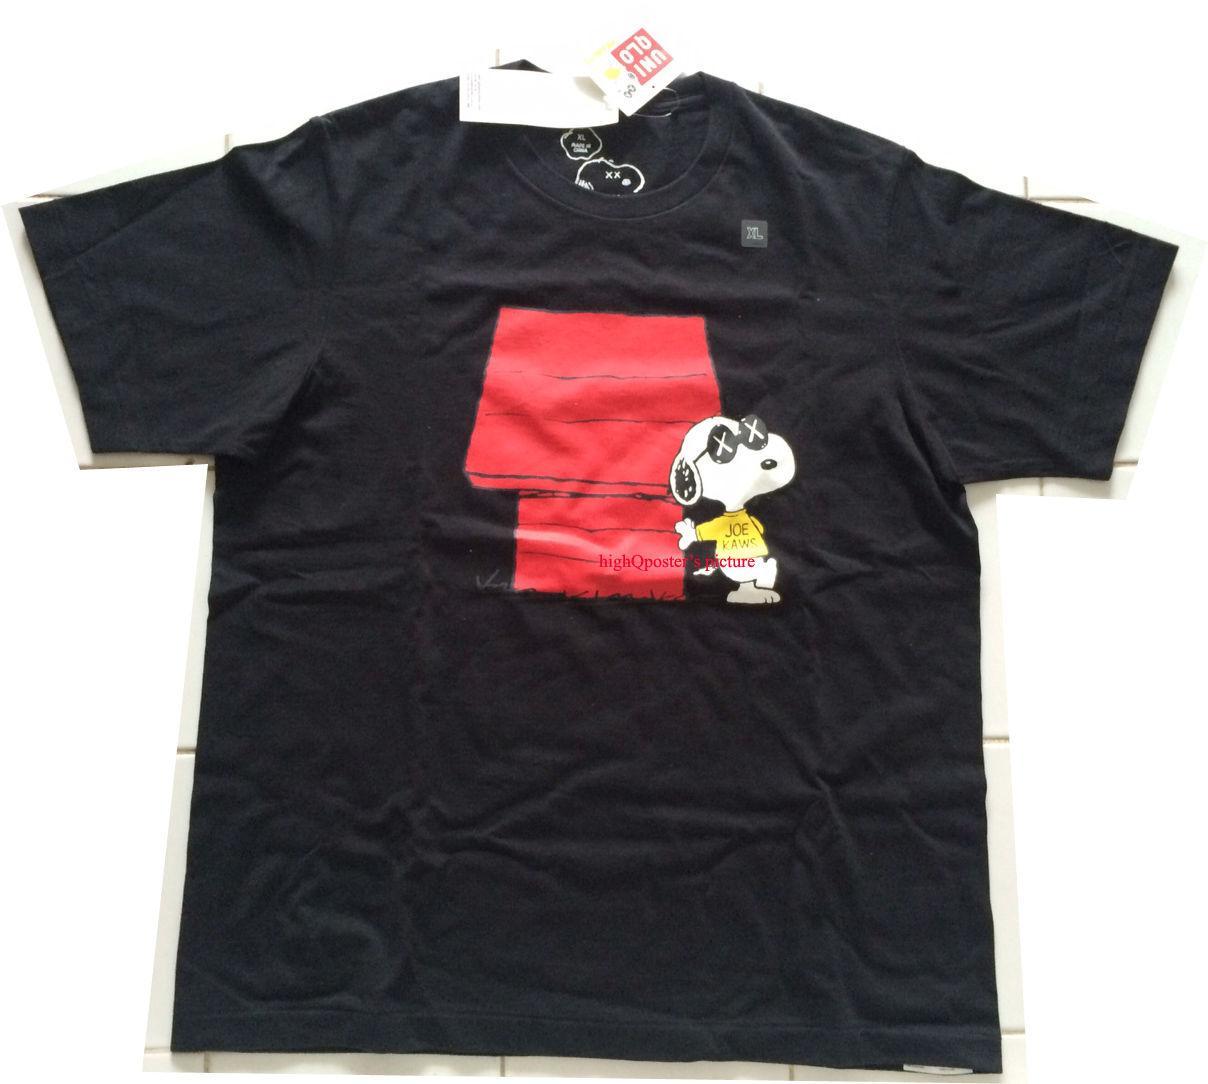 a2c1498d65 Uniqlo X Joe Kaws PEANUT Snoopy T SHIRT Brand New BLACK W Red House XL Men  Women Unisex Fashion Tshirt Create T Shirts Skull T Shirts From ...